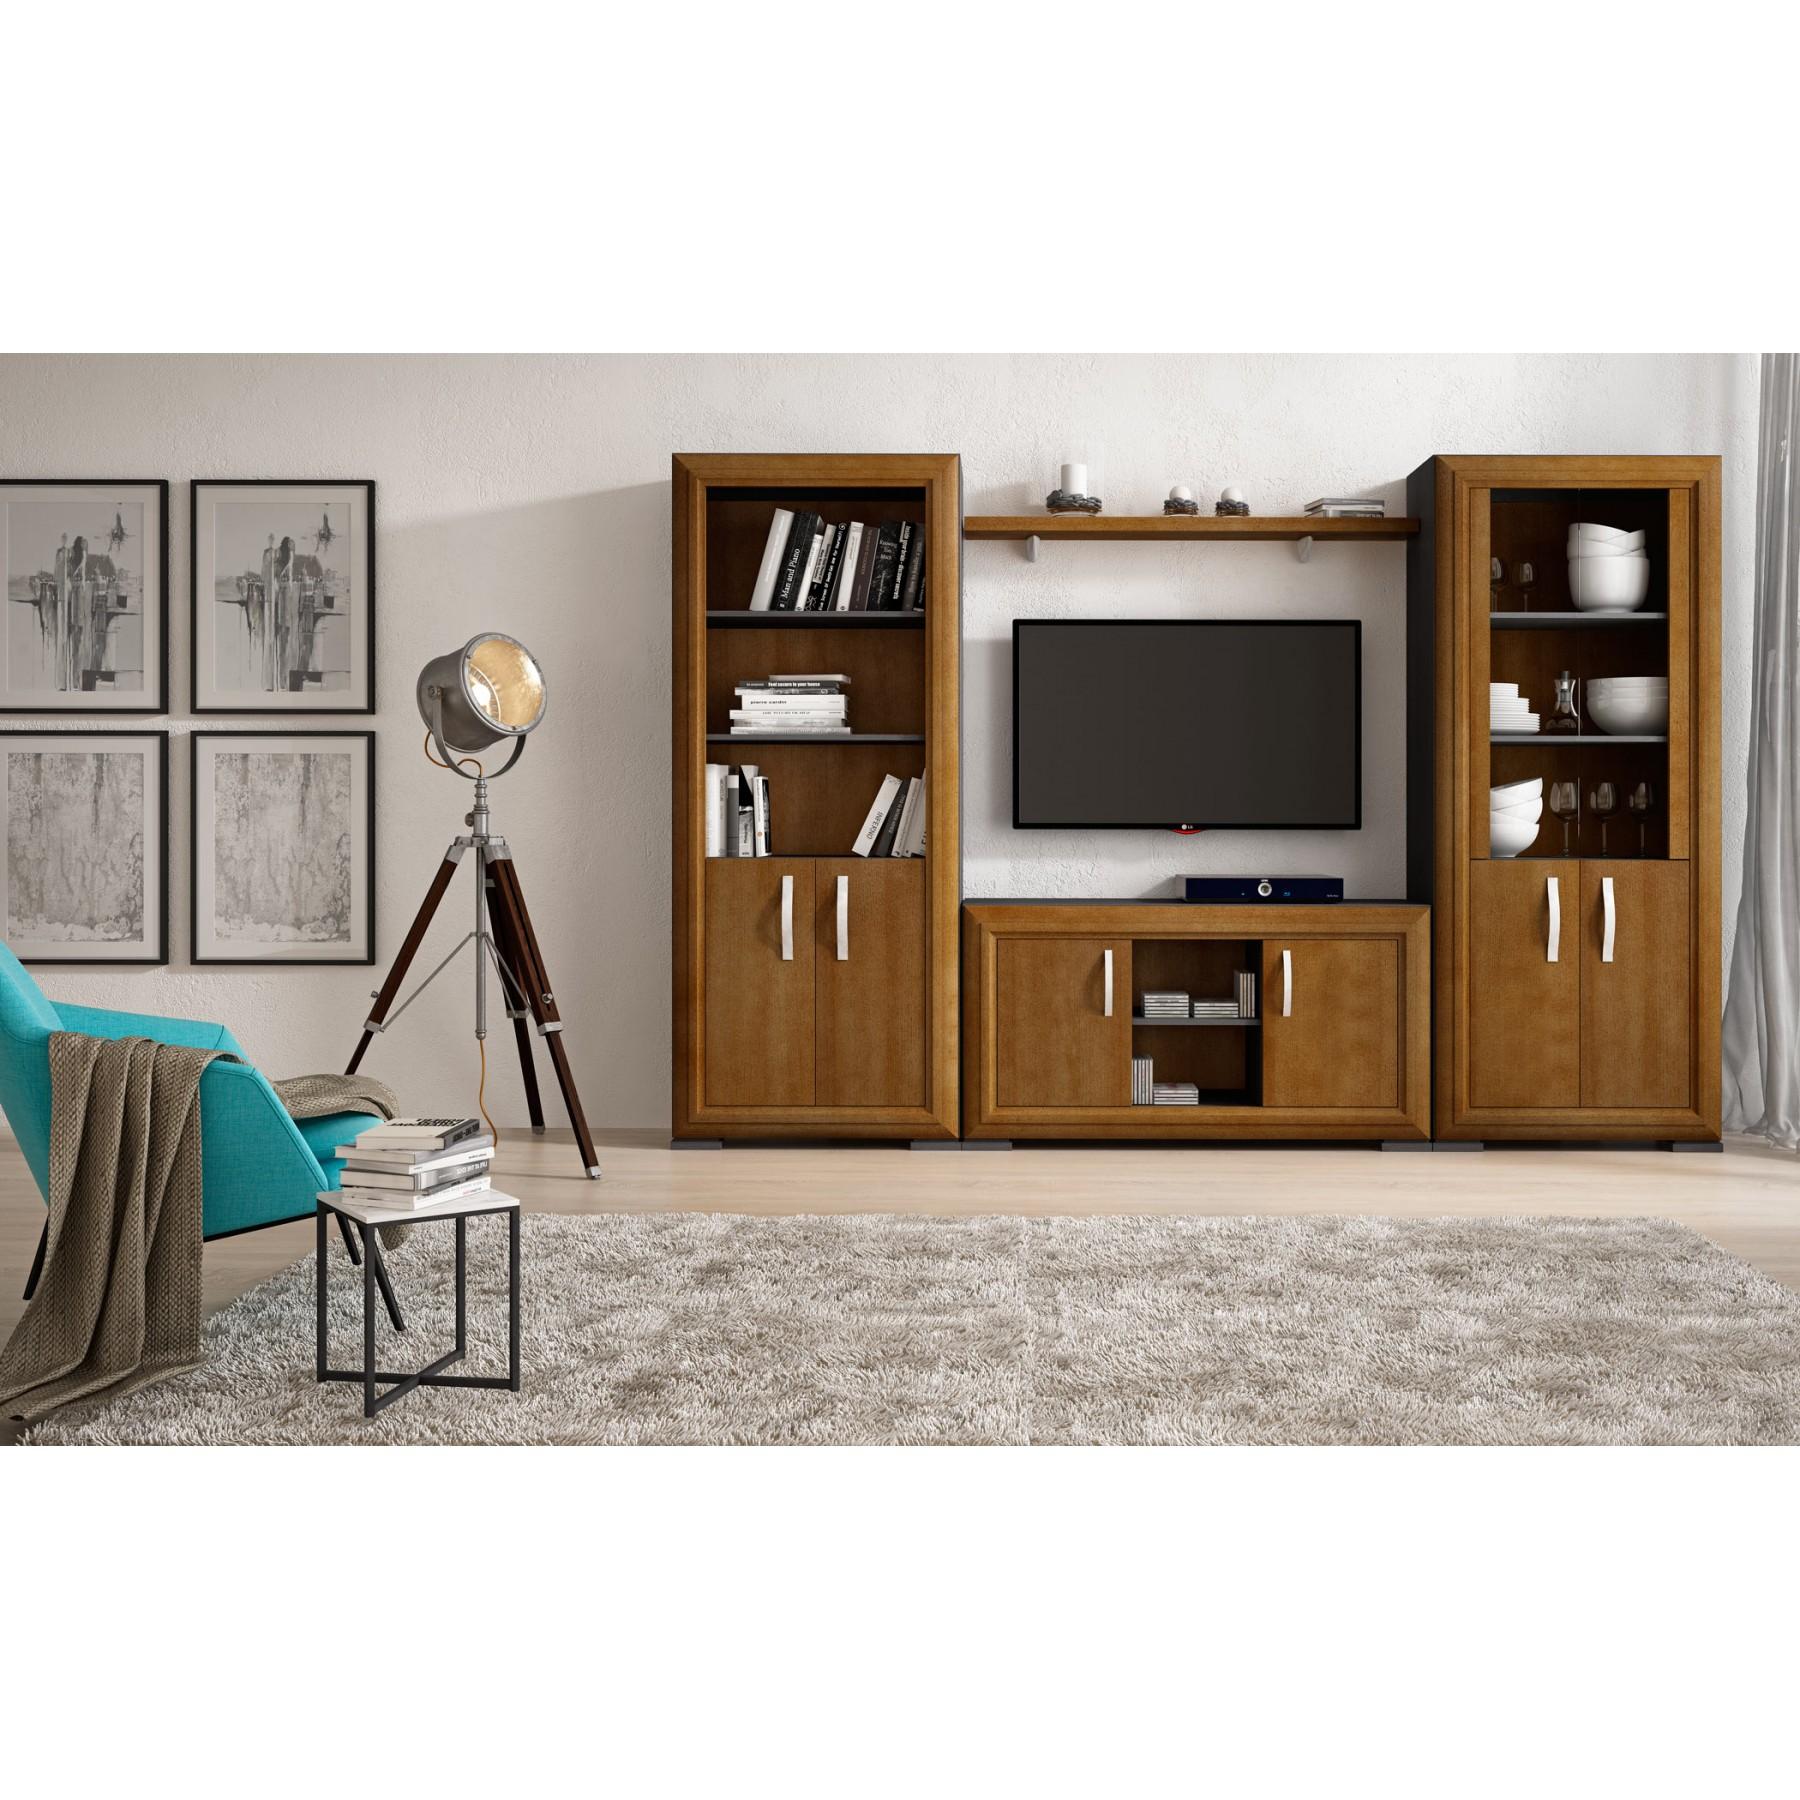 Muebles De Sal N Modelo Dalmacia # Muebles Hispania